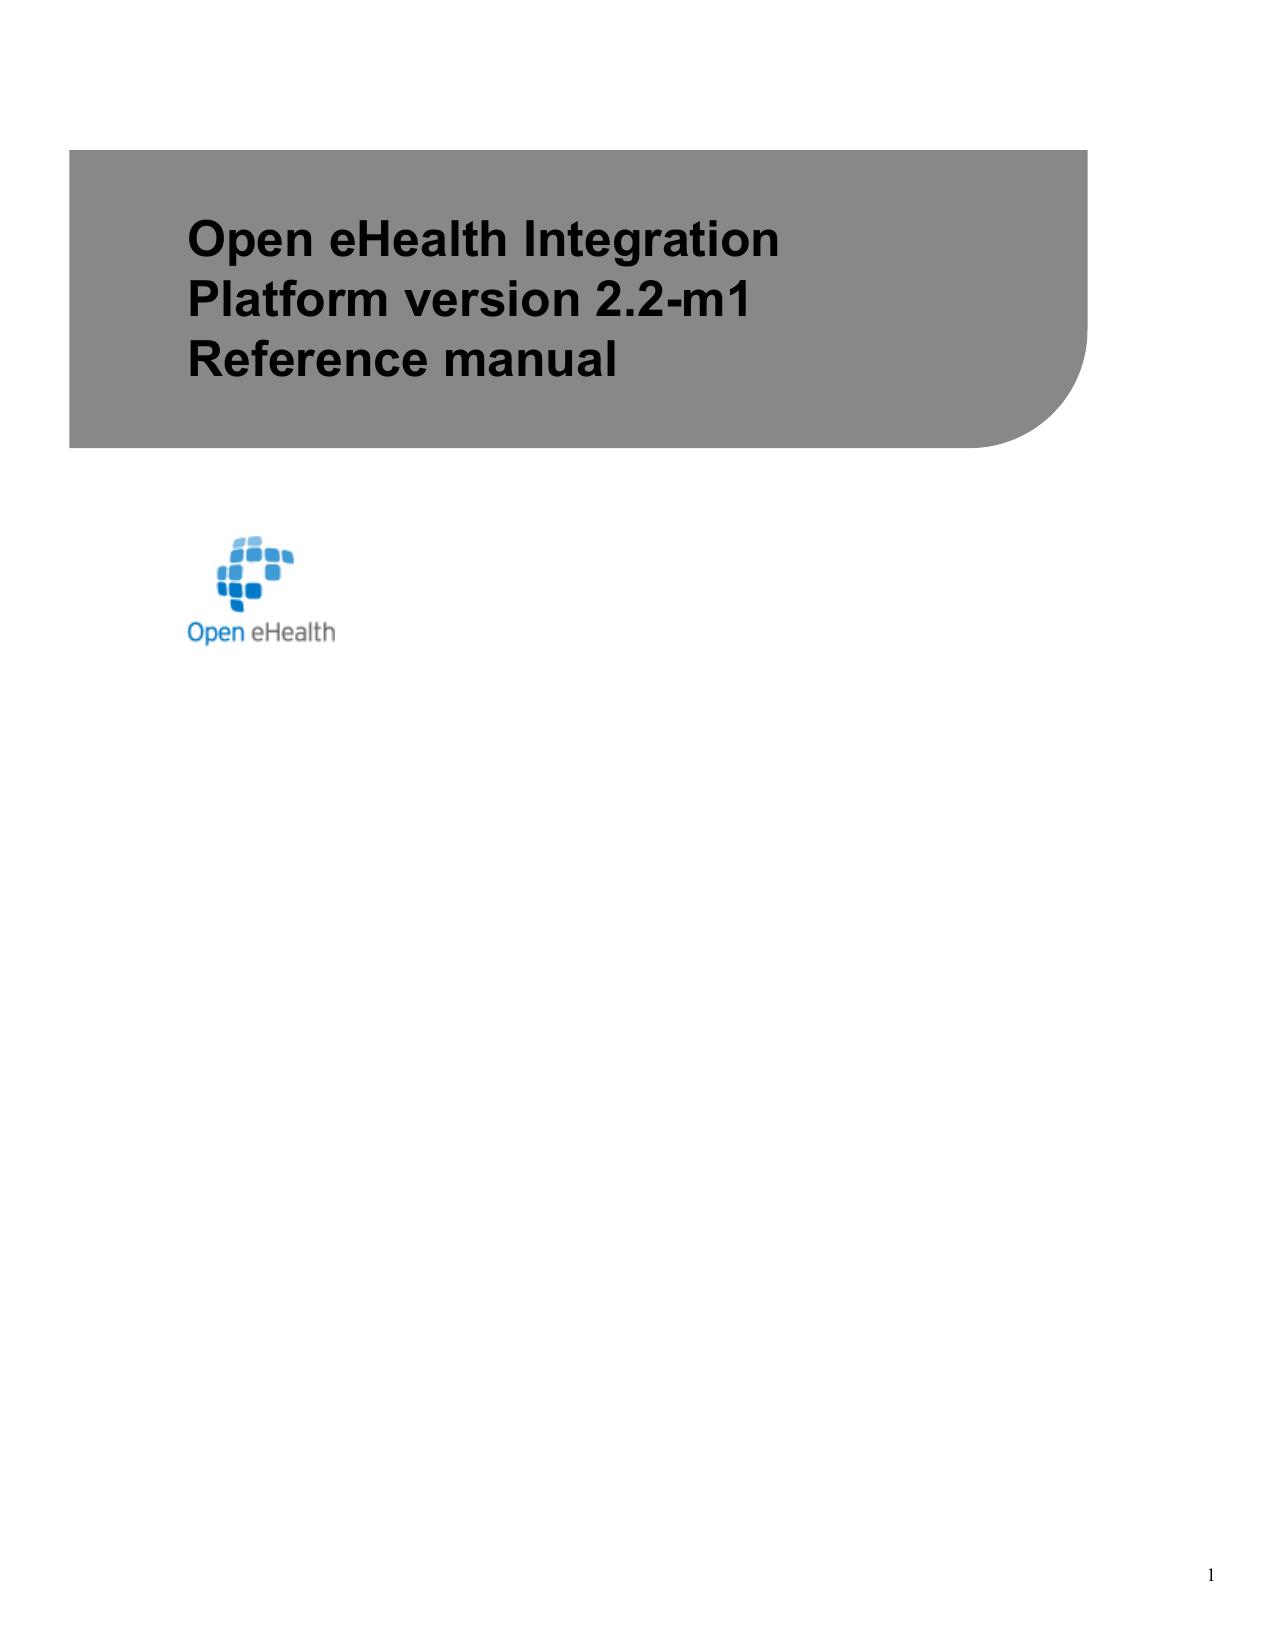 Open eHealth Integration Platform reference manual | manualzz com